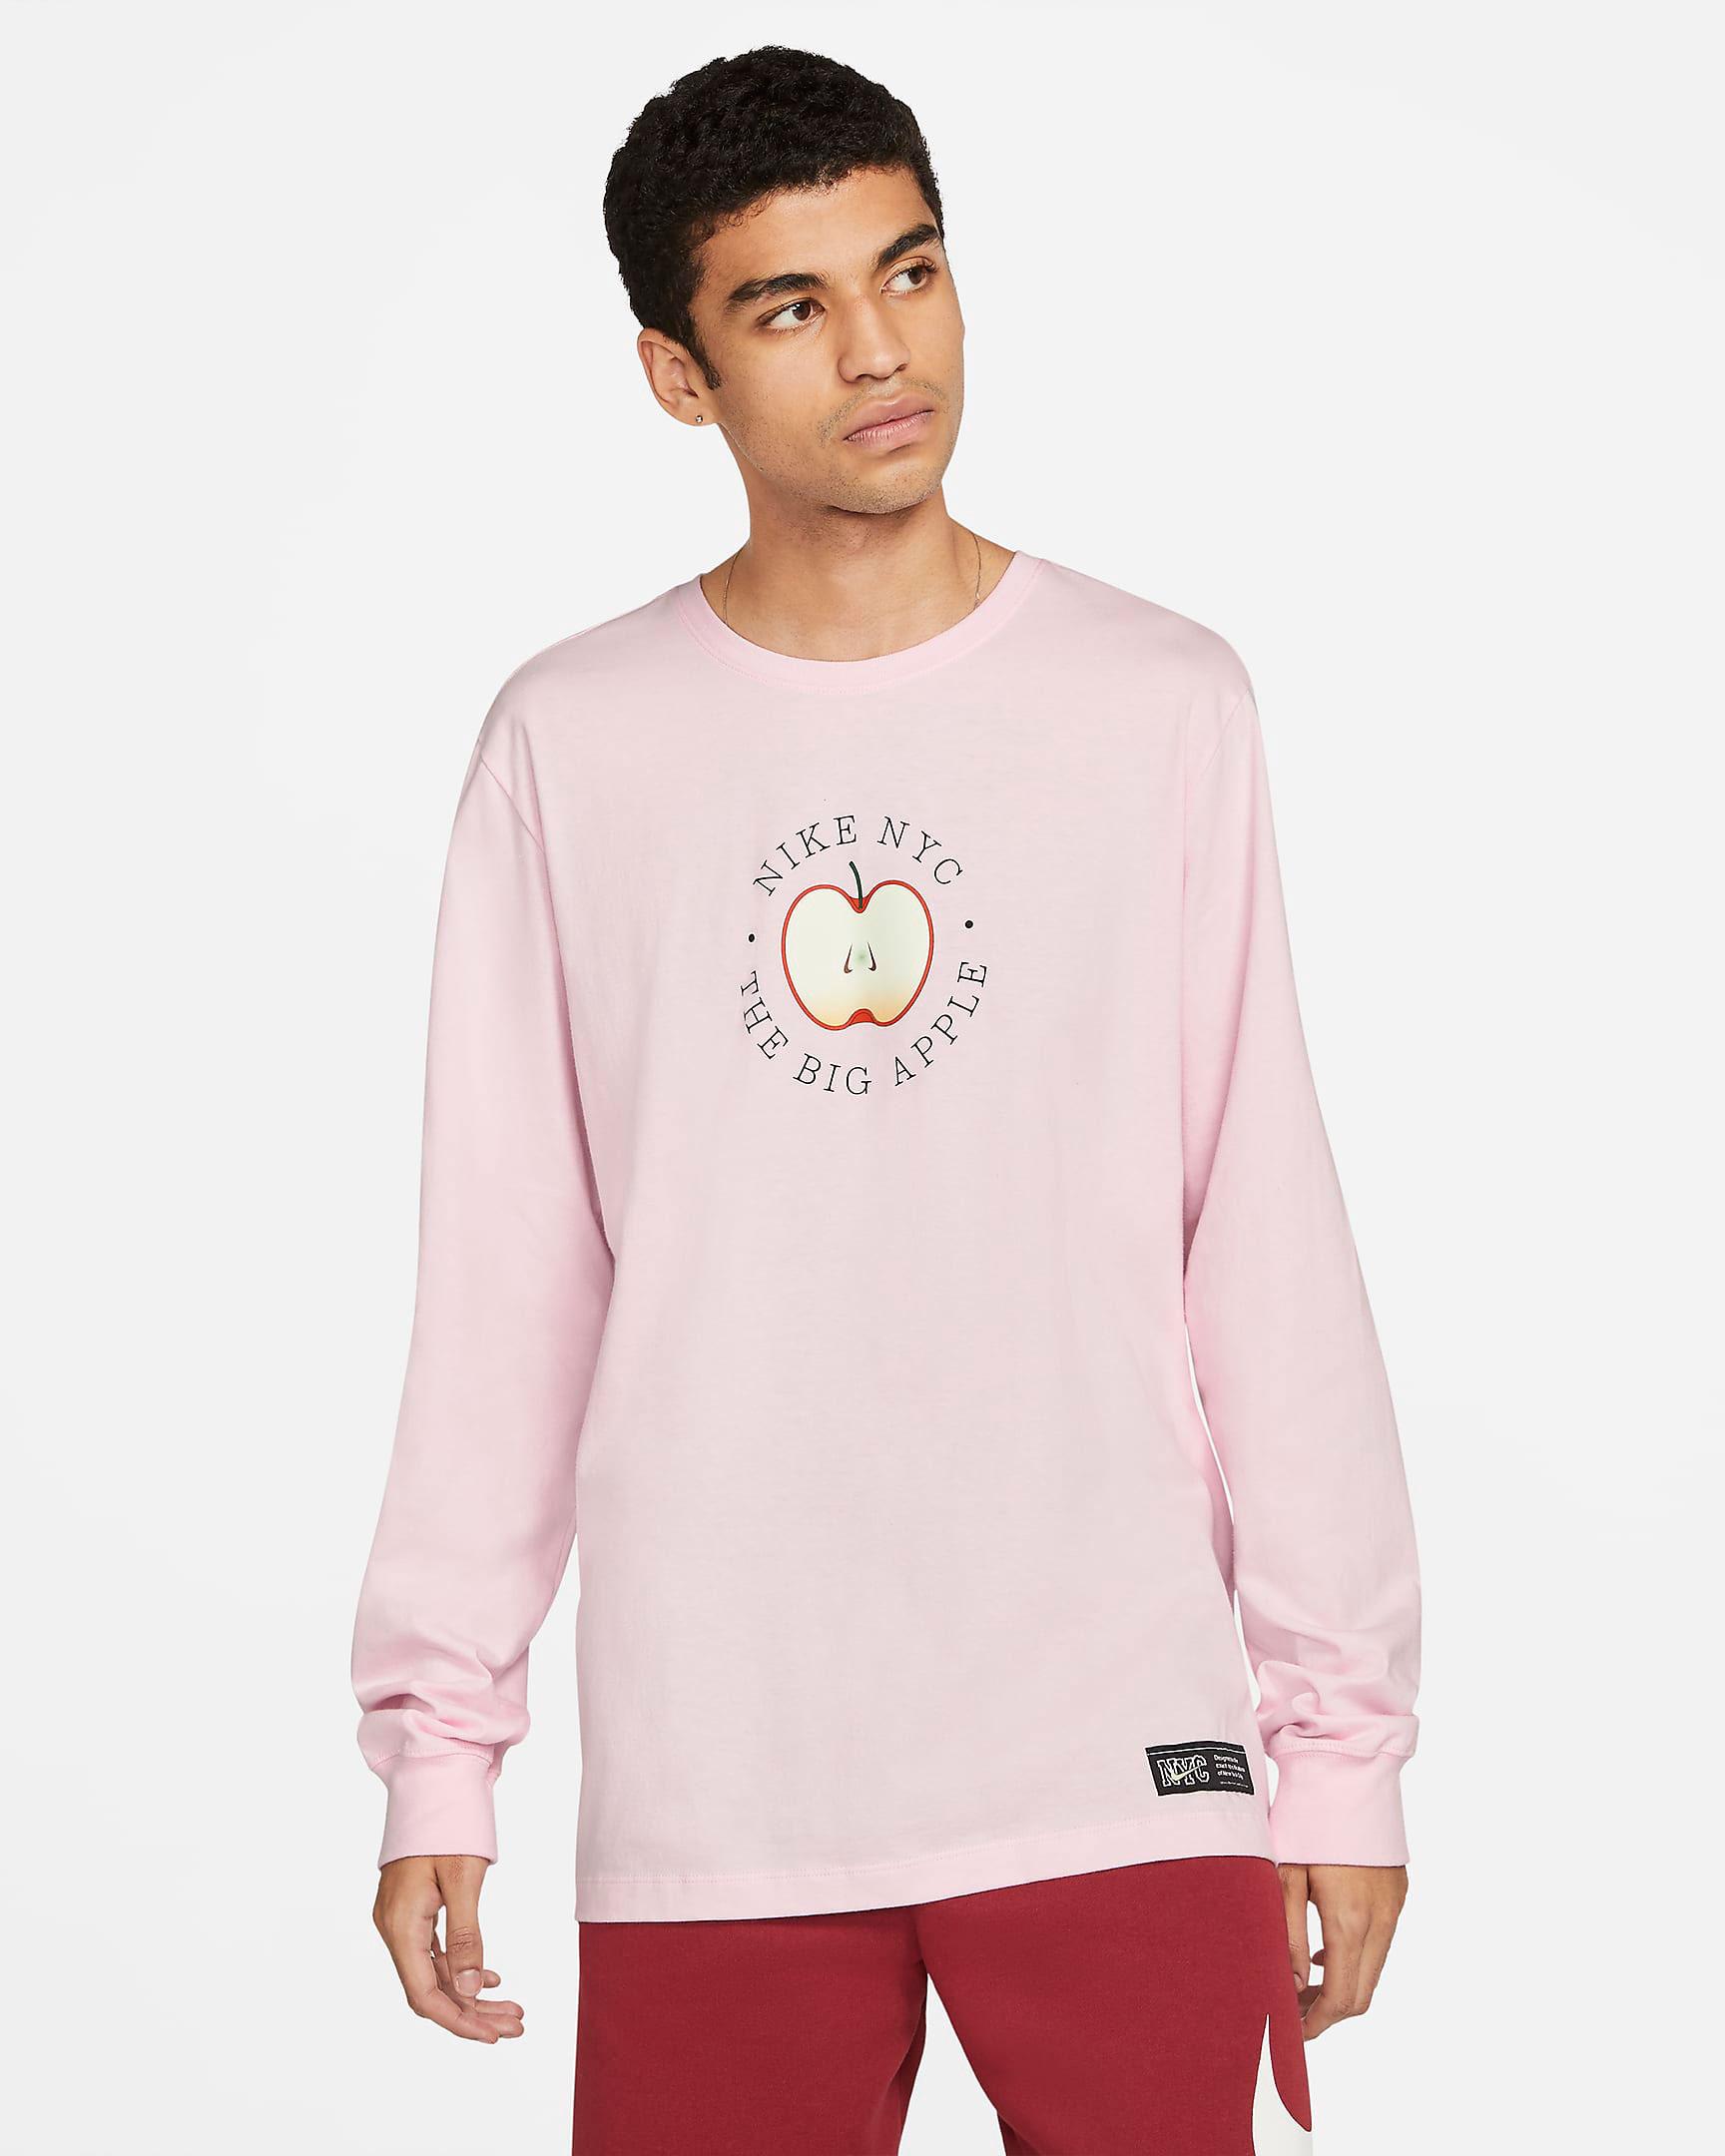 nike-nyc-pink-foam-shirt-1